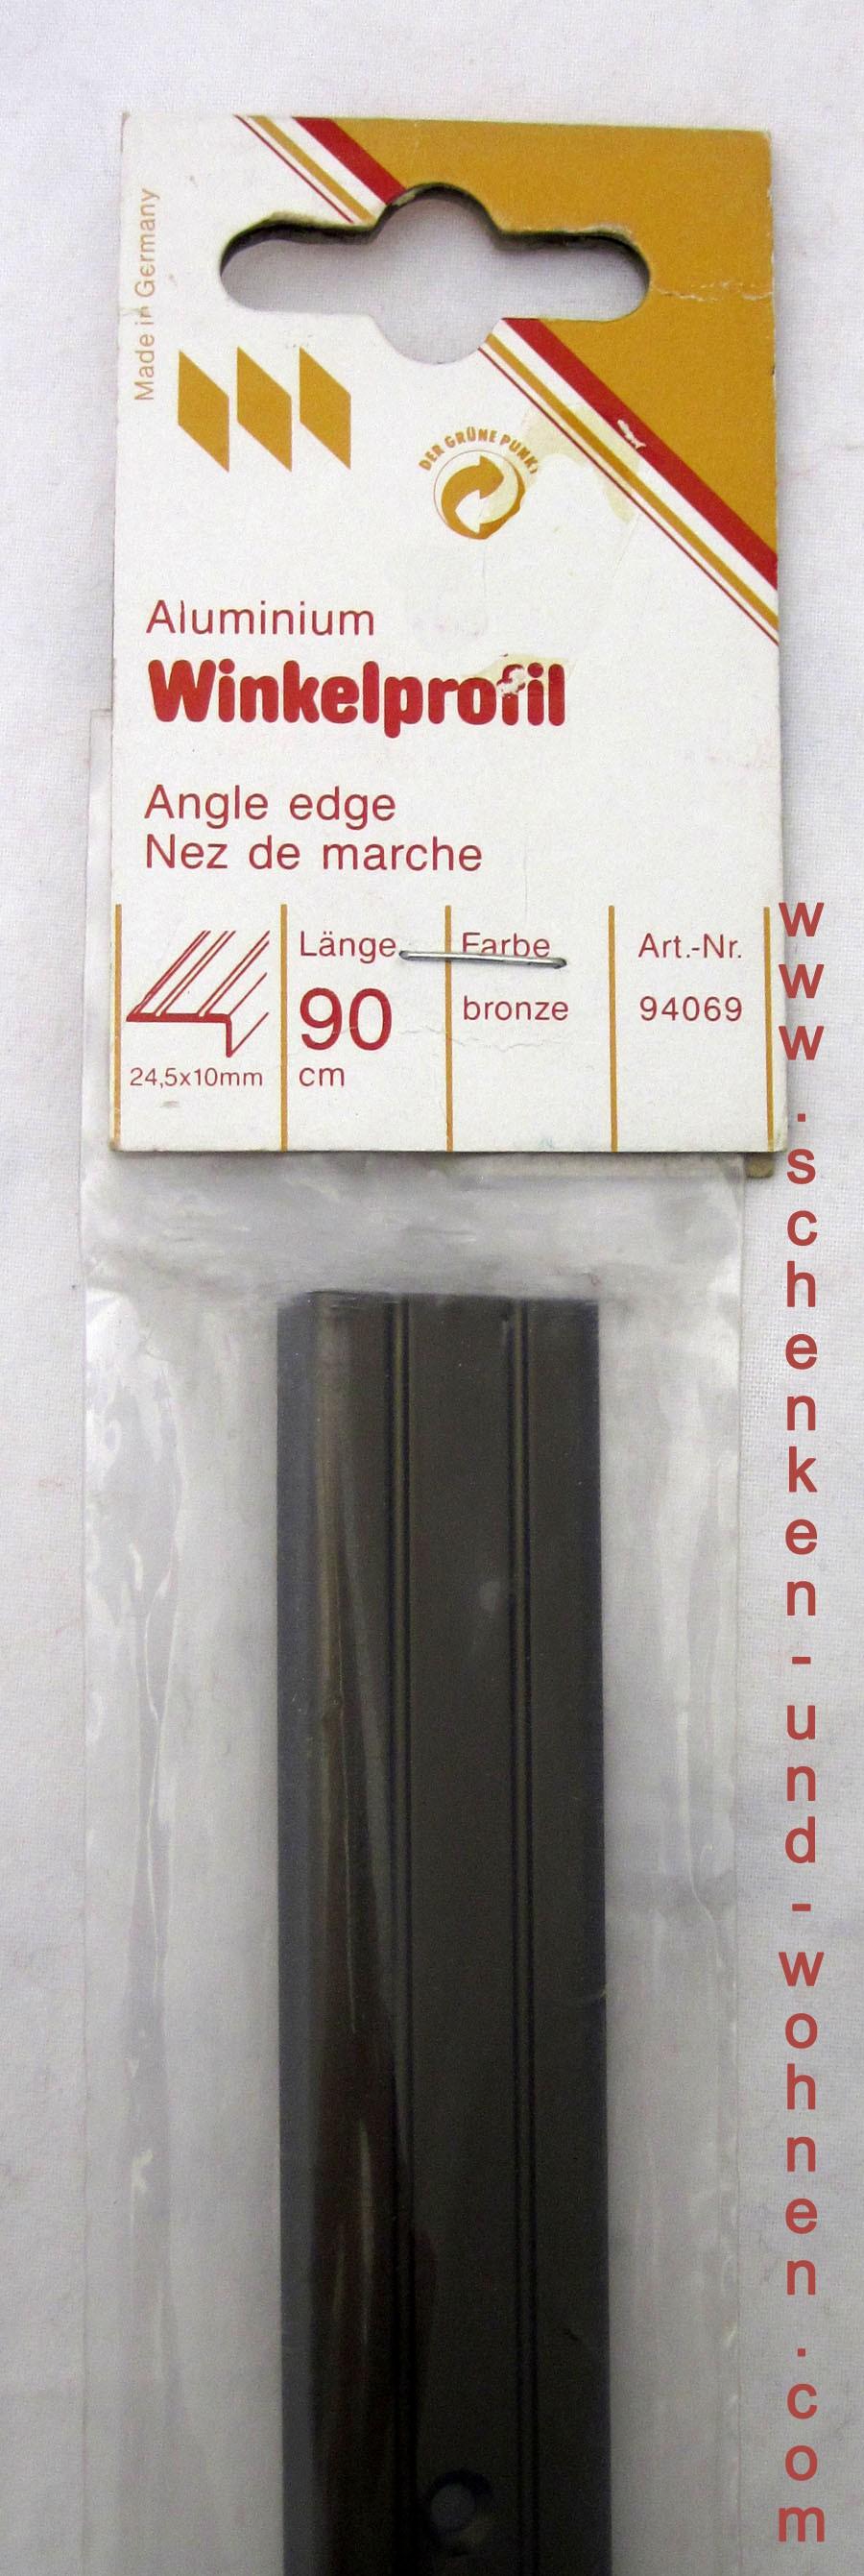 Winkelprofill Bodenprofil bronze dunkel 24,5x10x90 cm